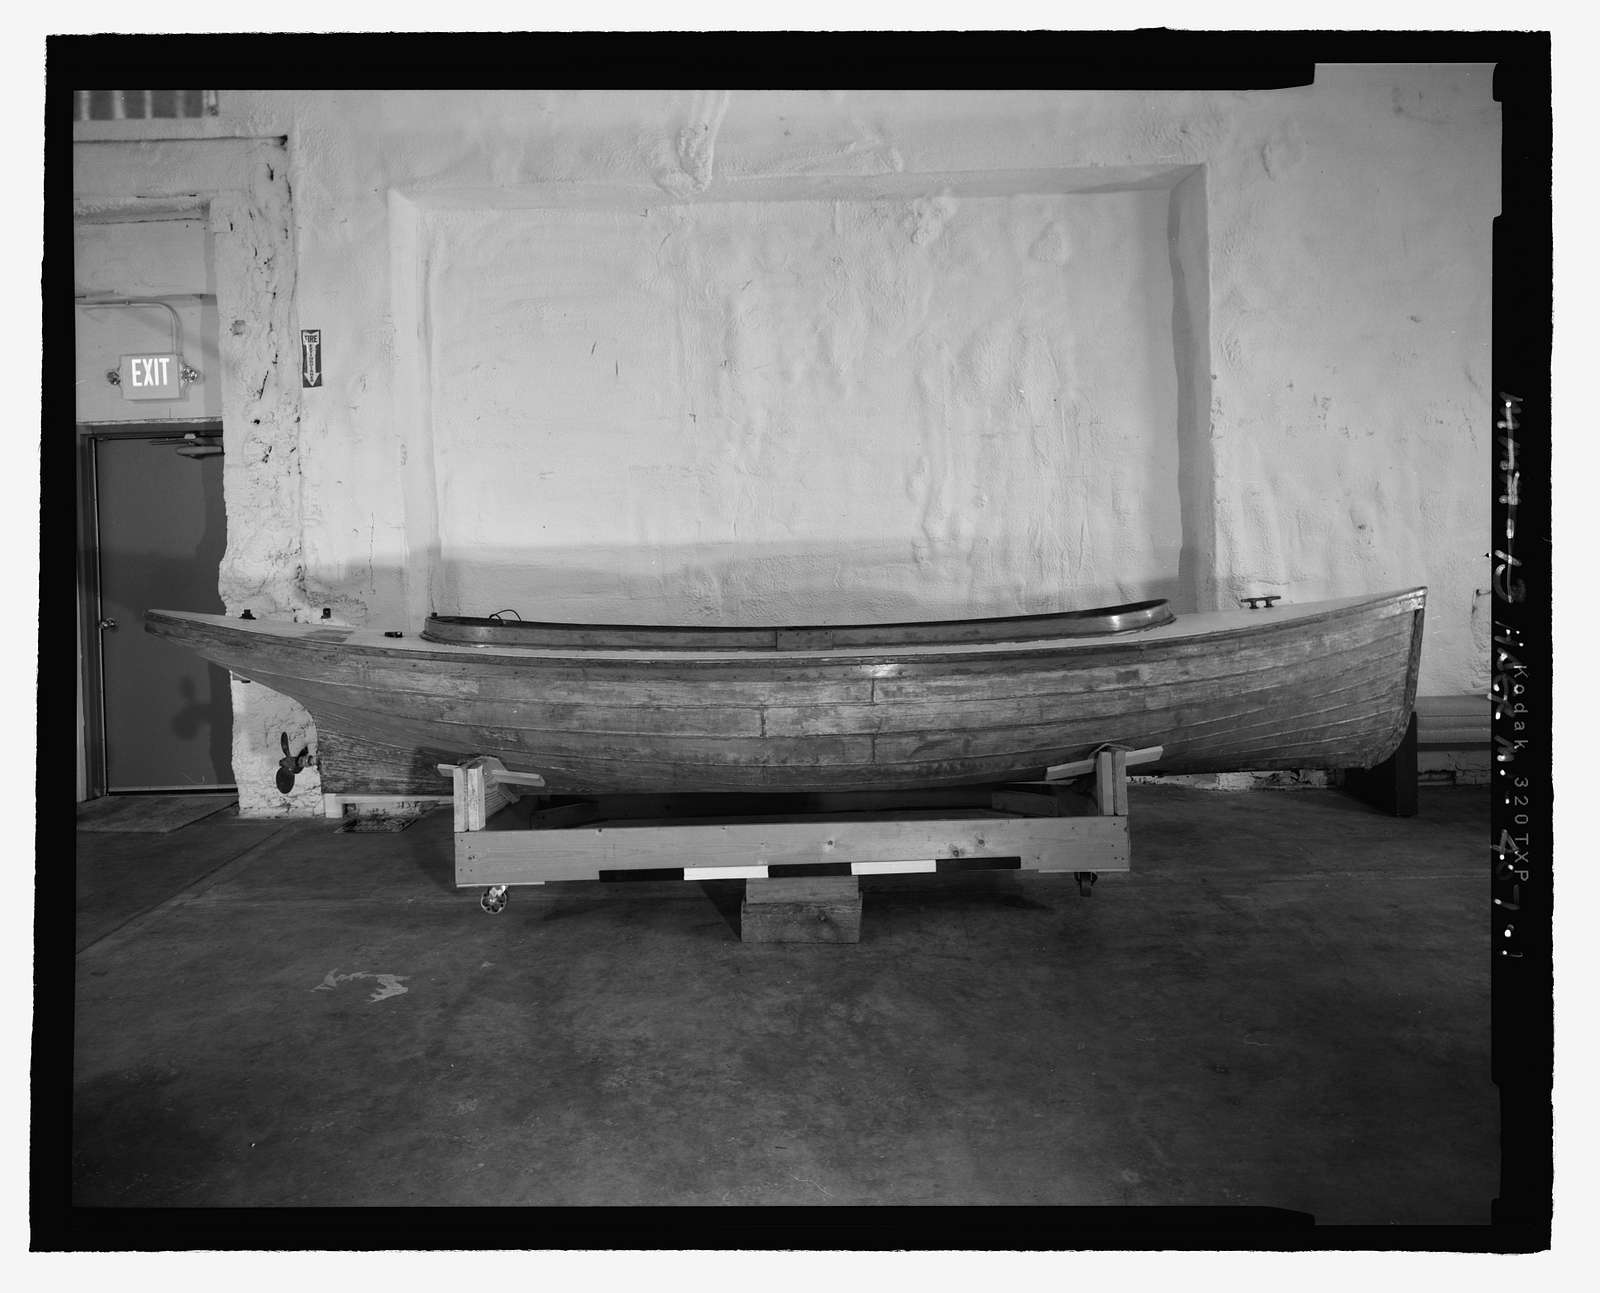 Metal Fantail Launch, Michigan Maritime Museum, South Haven, Van Buren County, MI